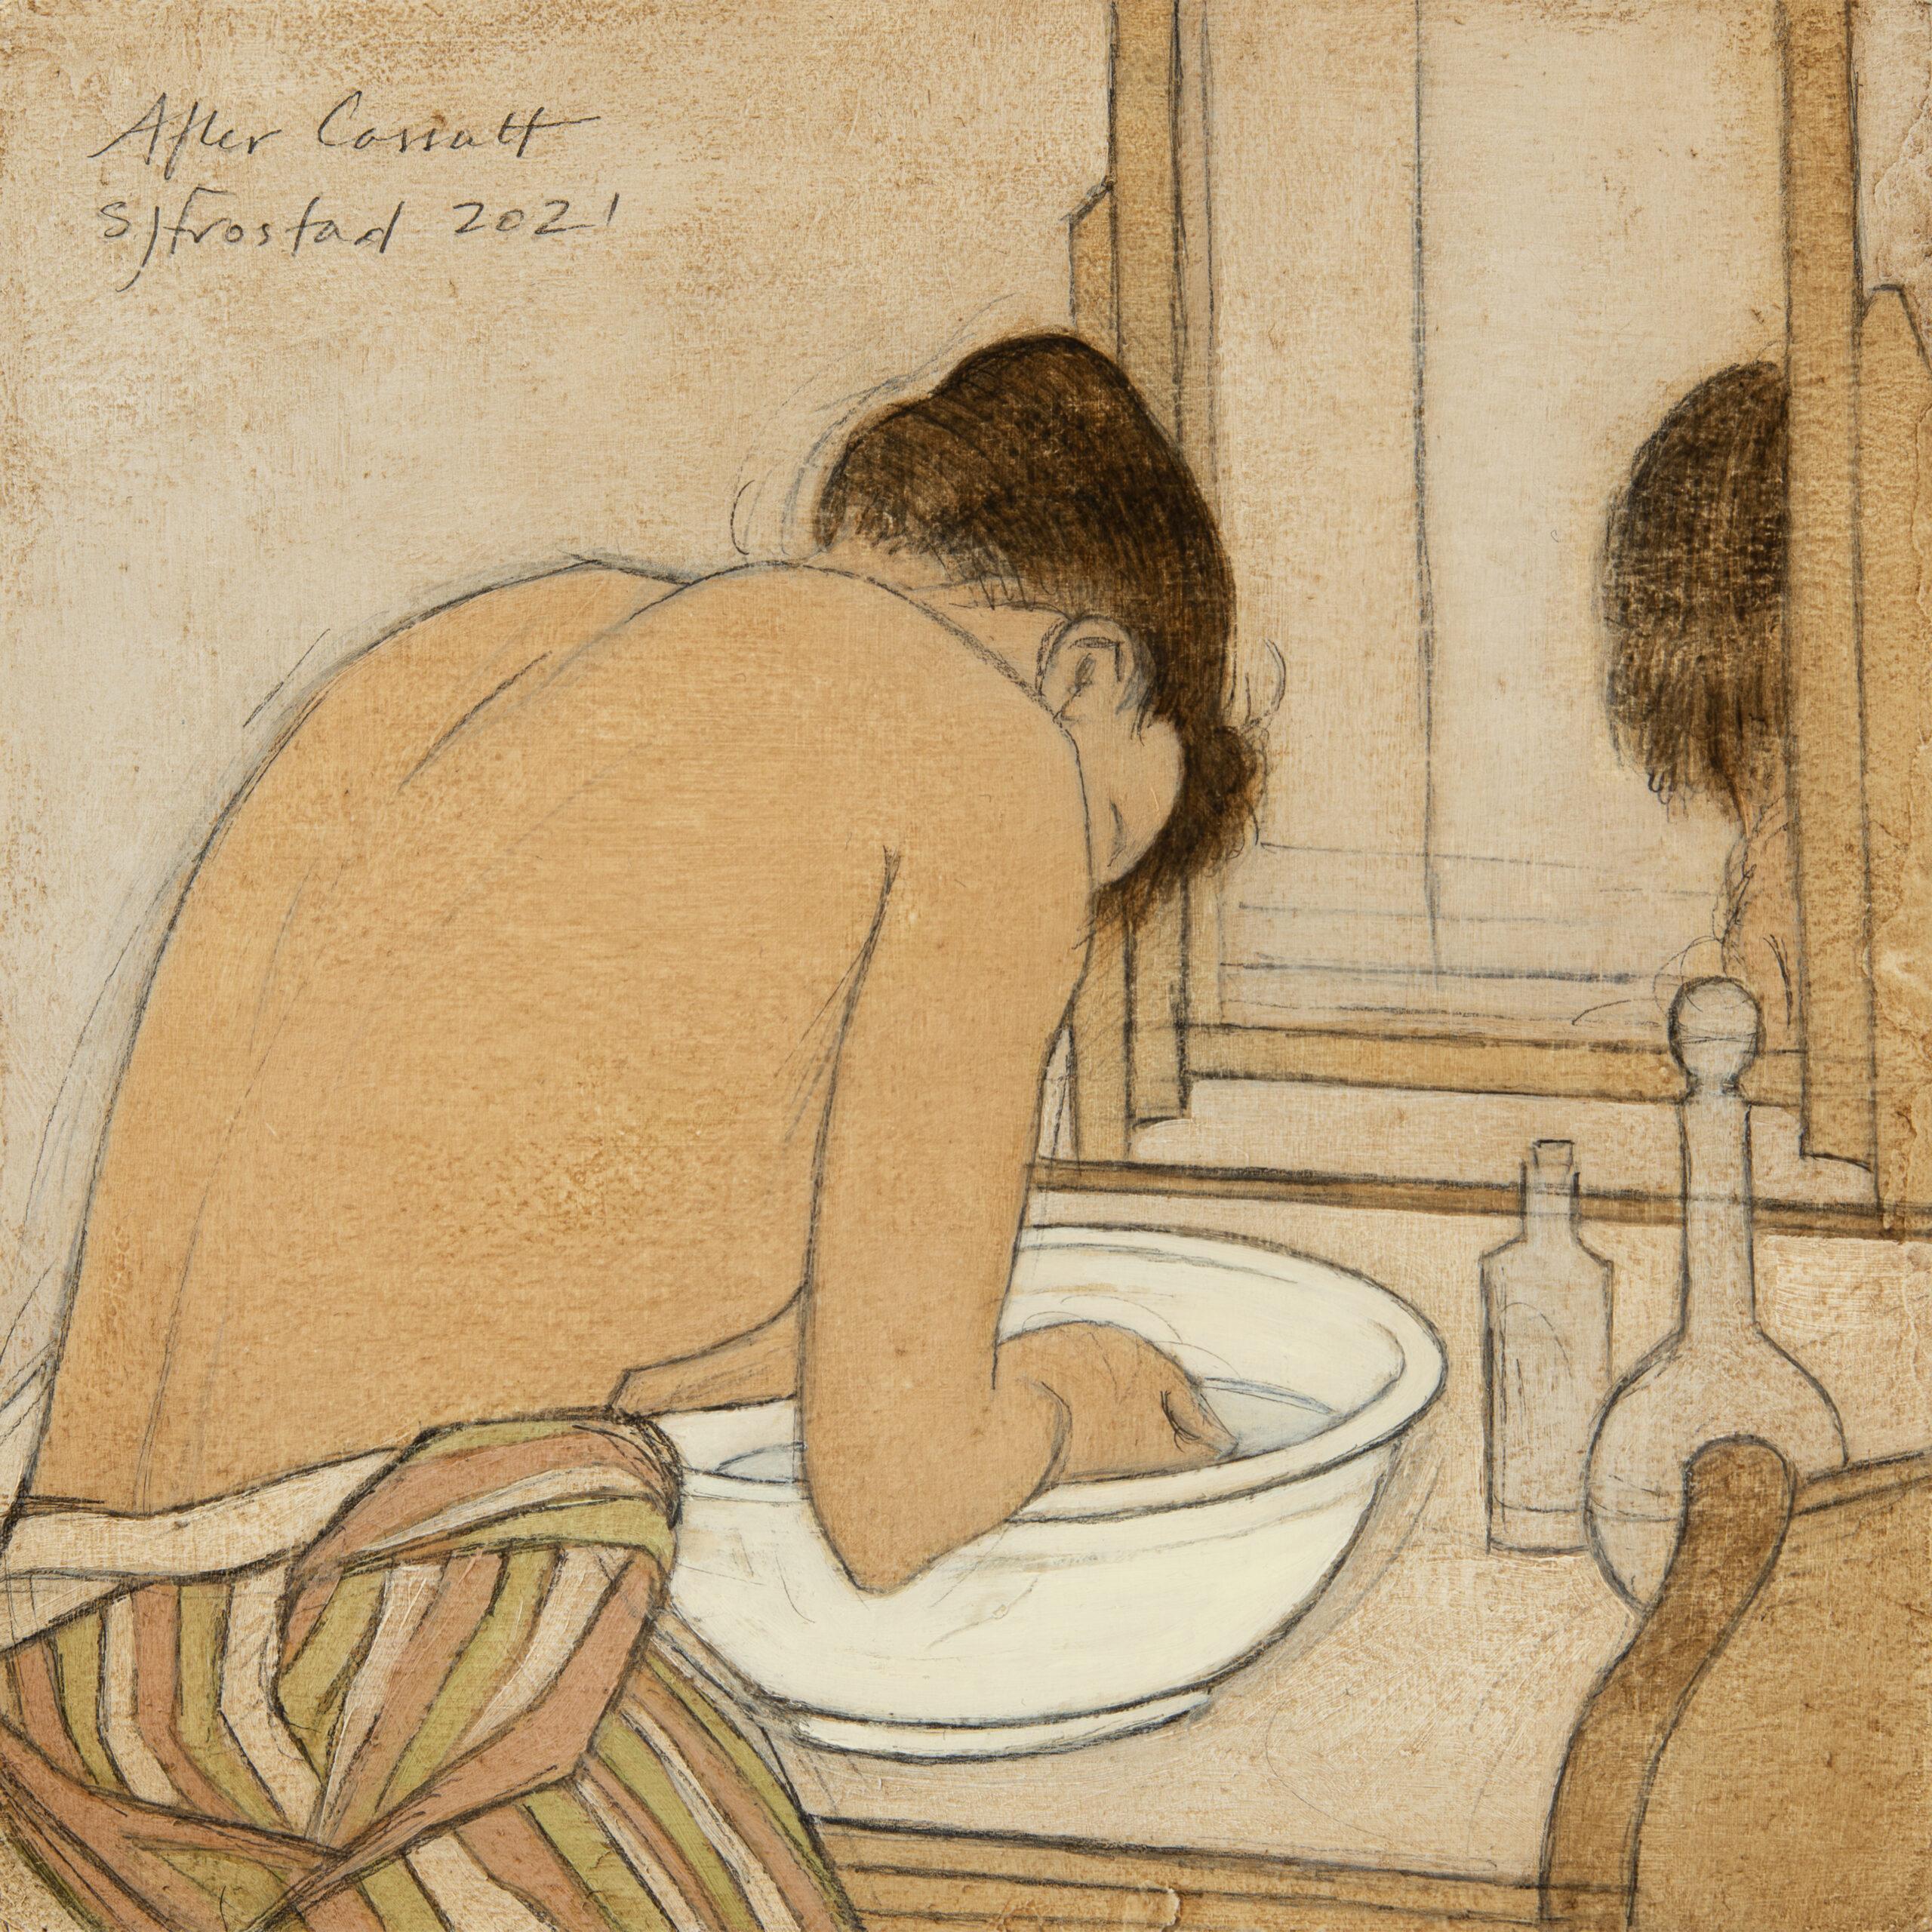 "Art Historical Potsketch: Cassatt, 2021. Graphite & oil on art board, 5x5""."